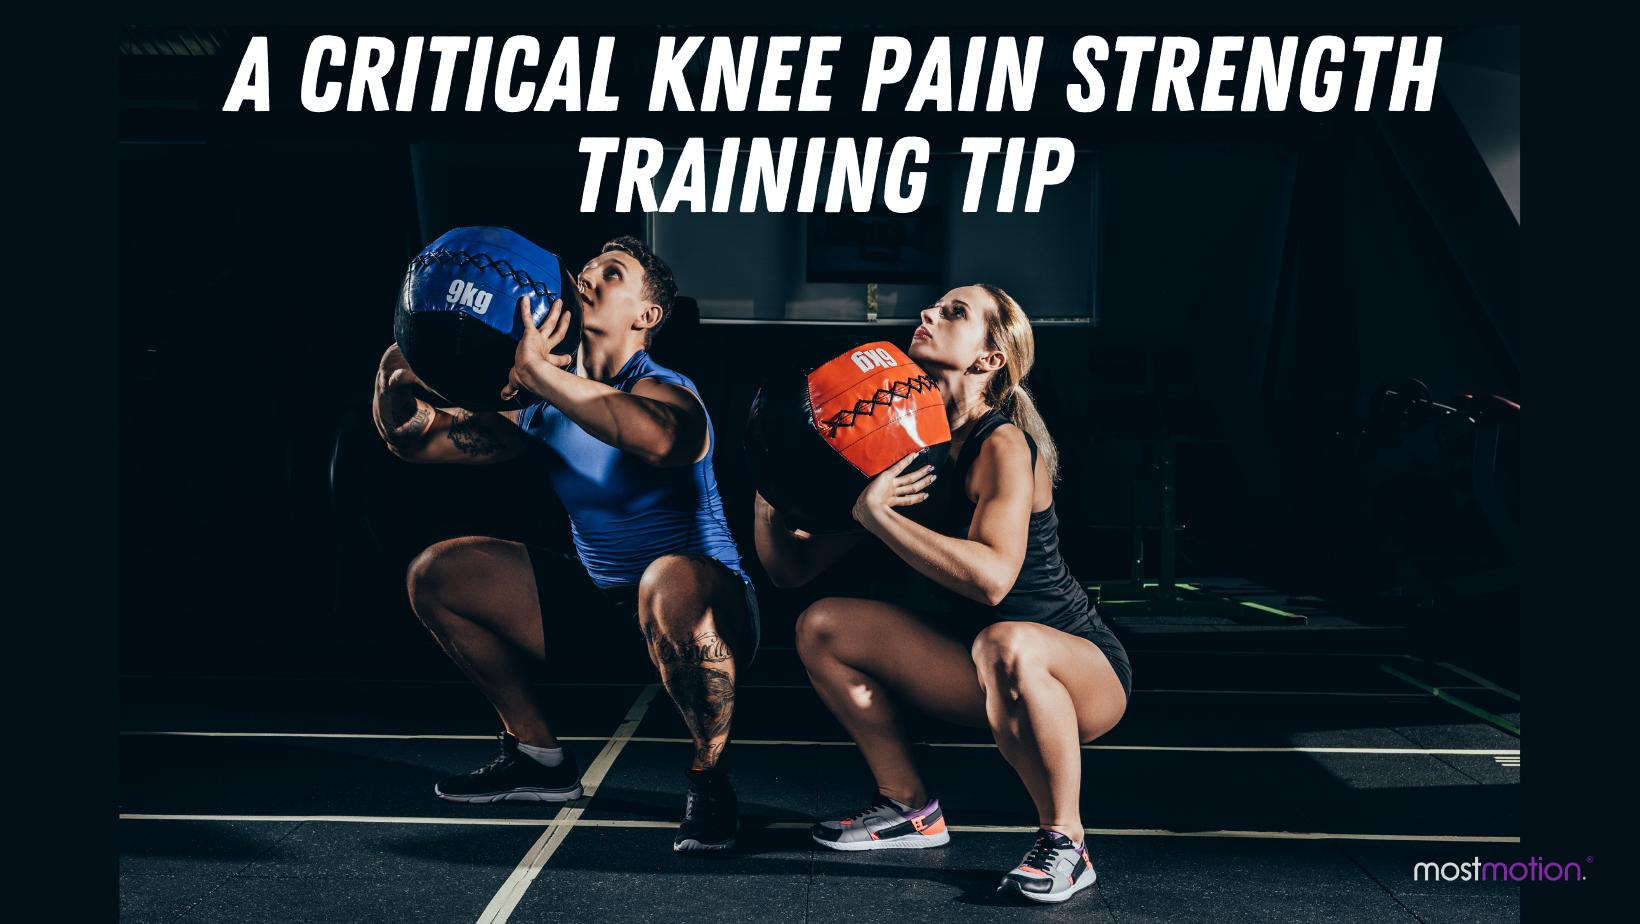 A Critical Knee Pain Strength Training Tip